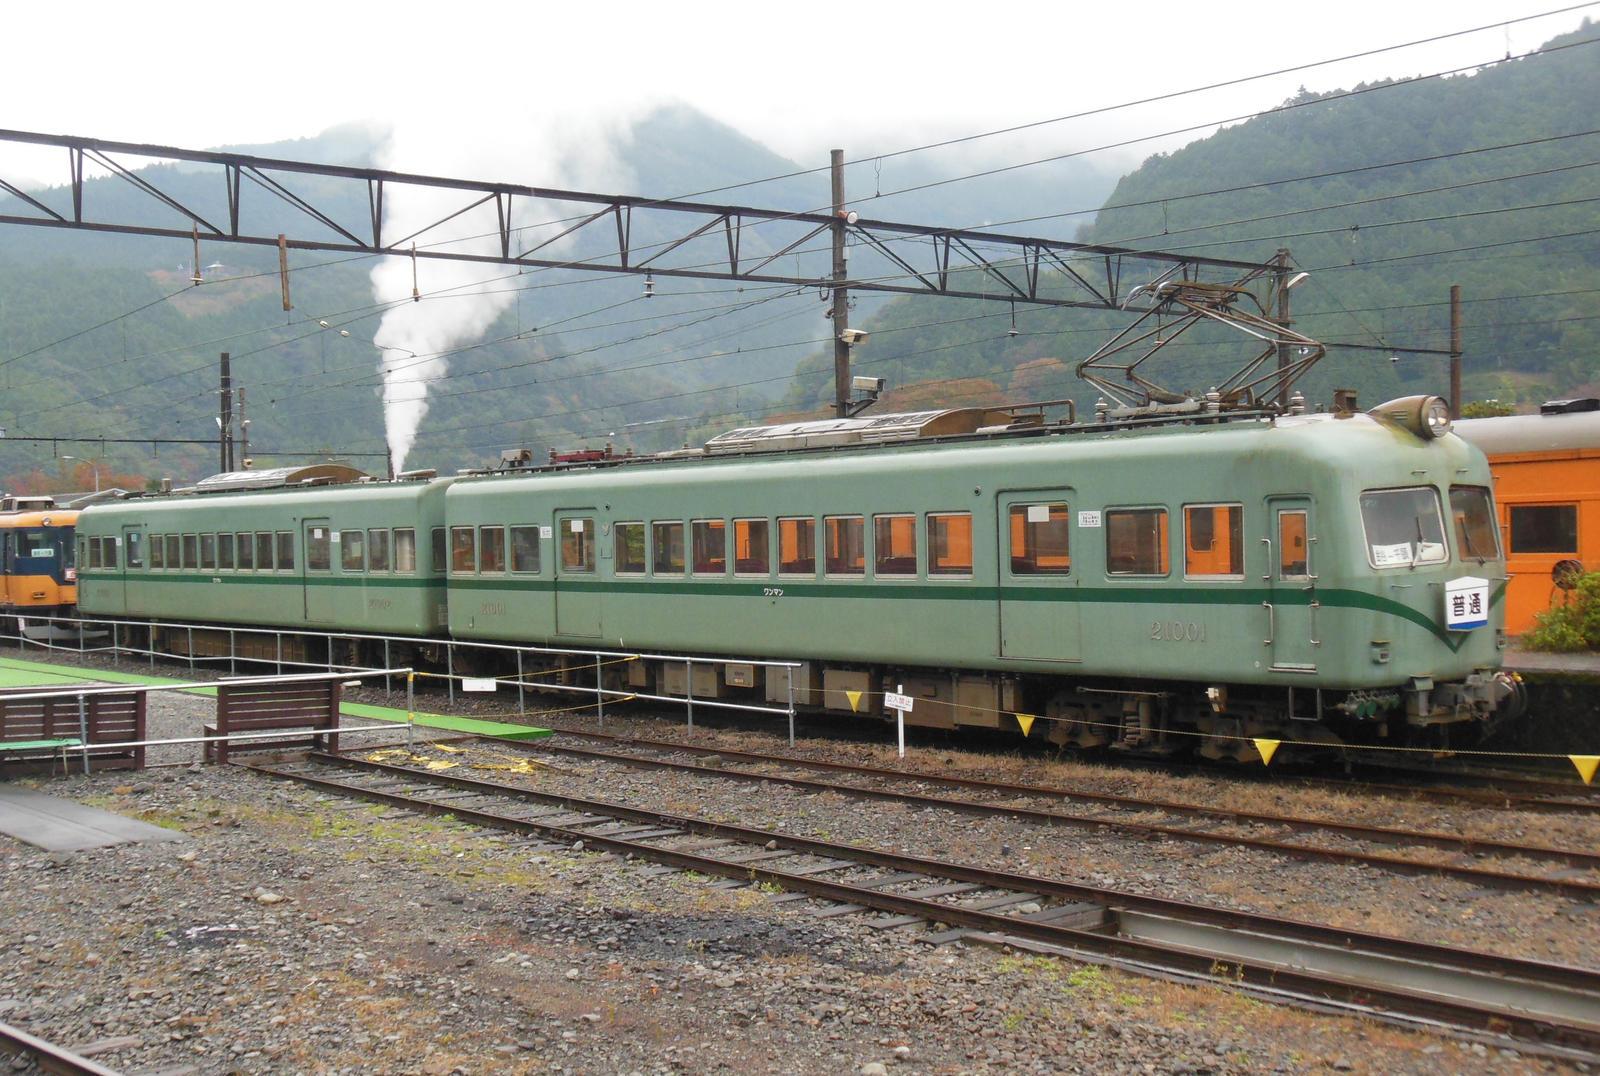 Nankai 21001/21002 and Background Steam by rlkitterman